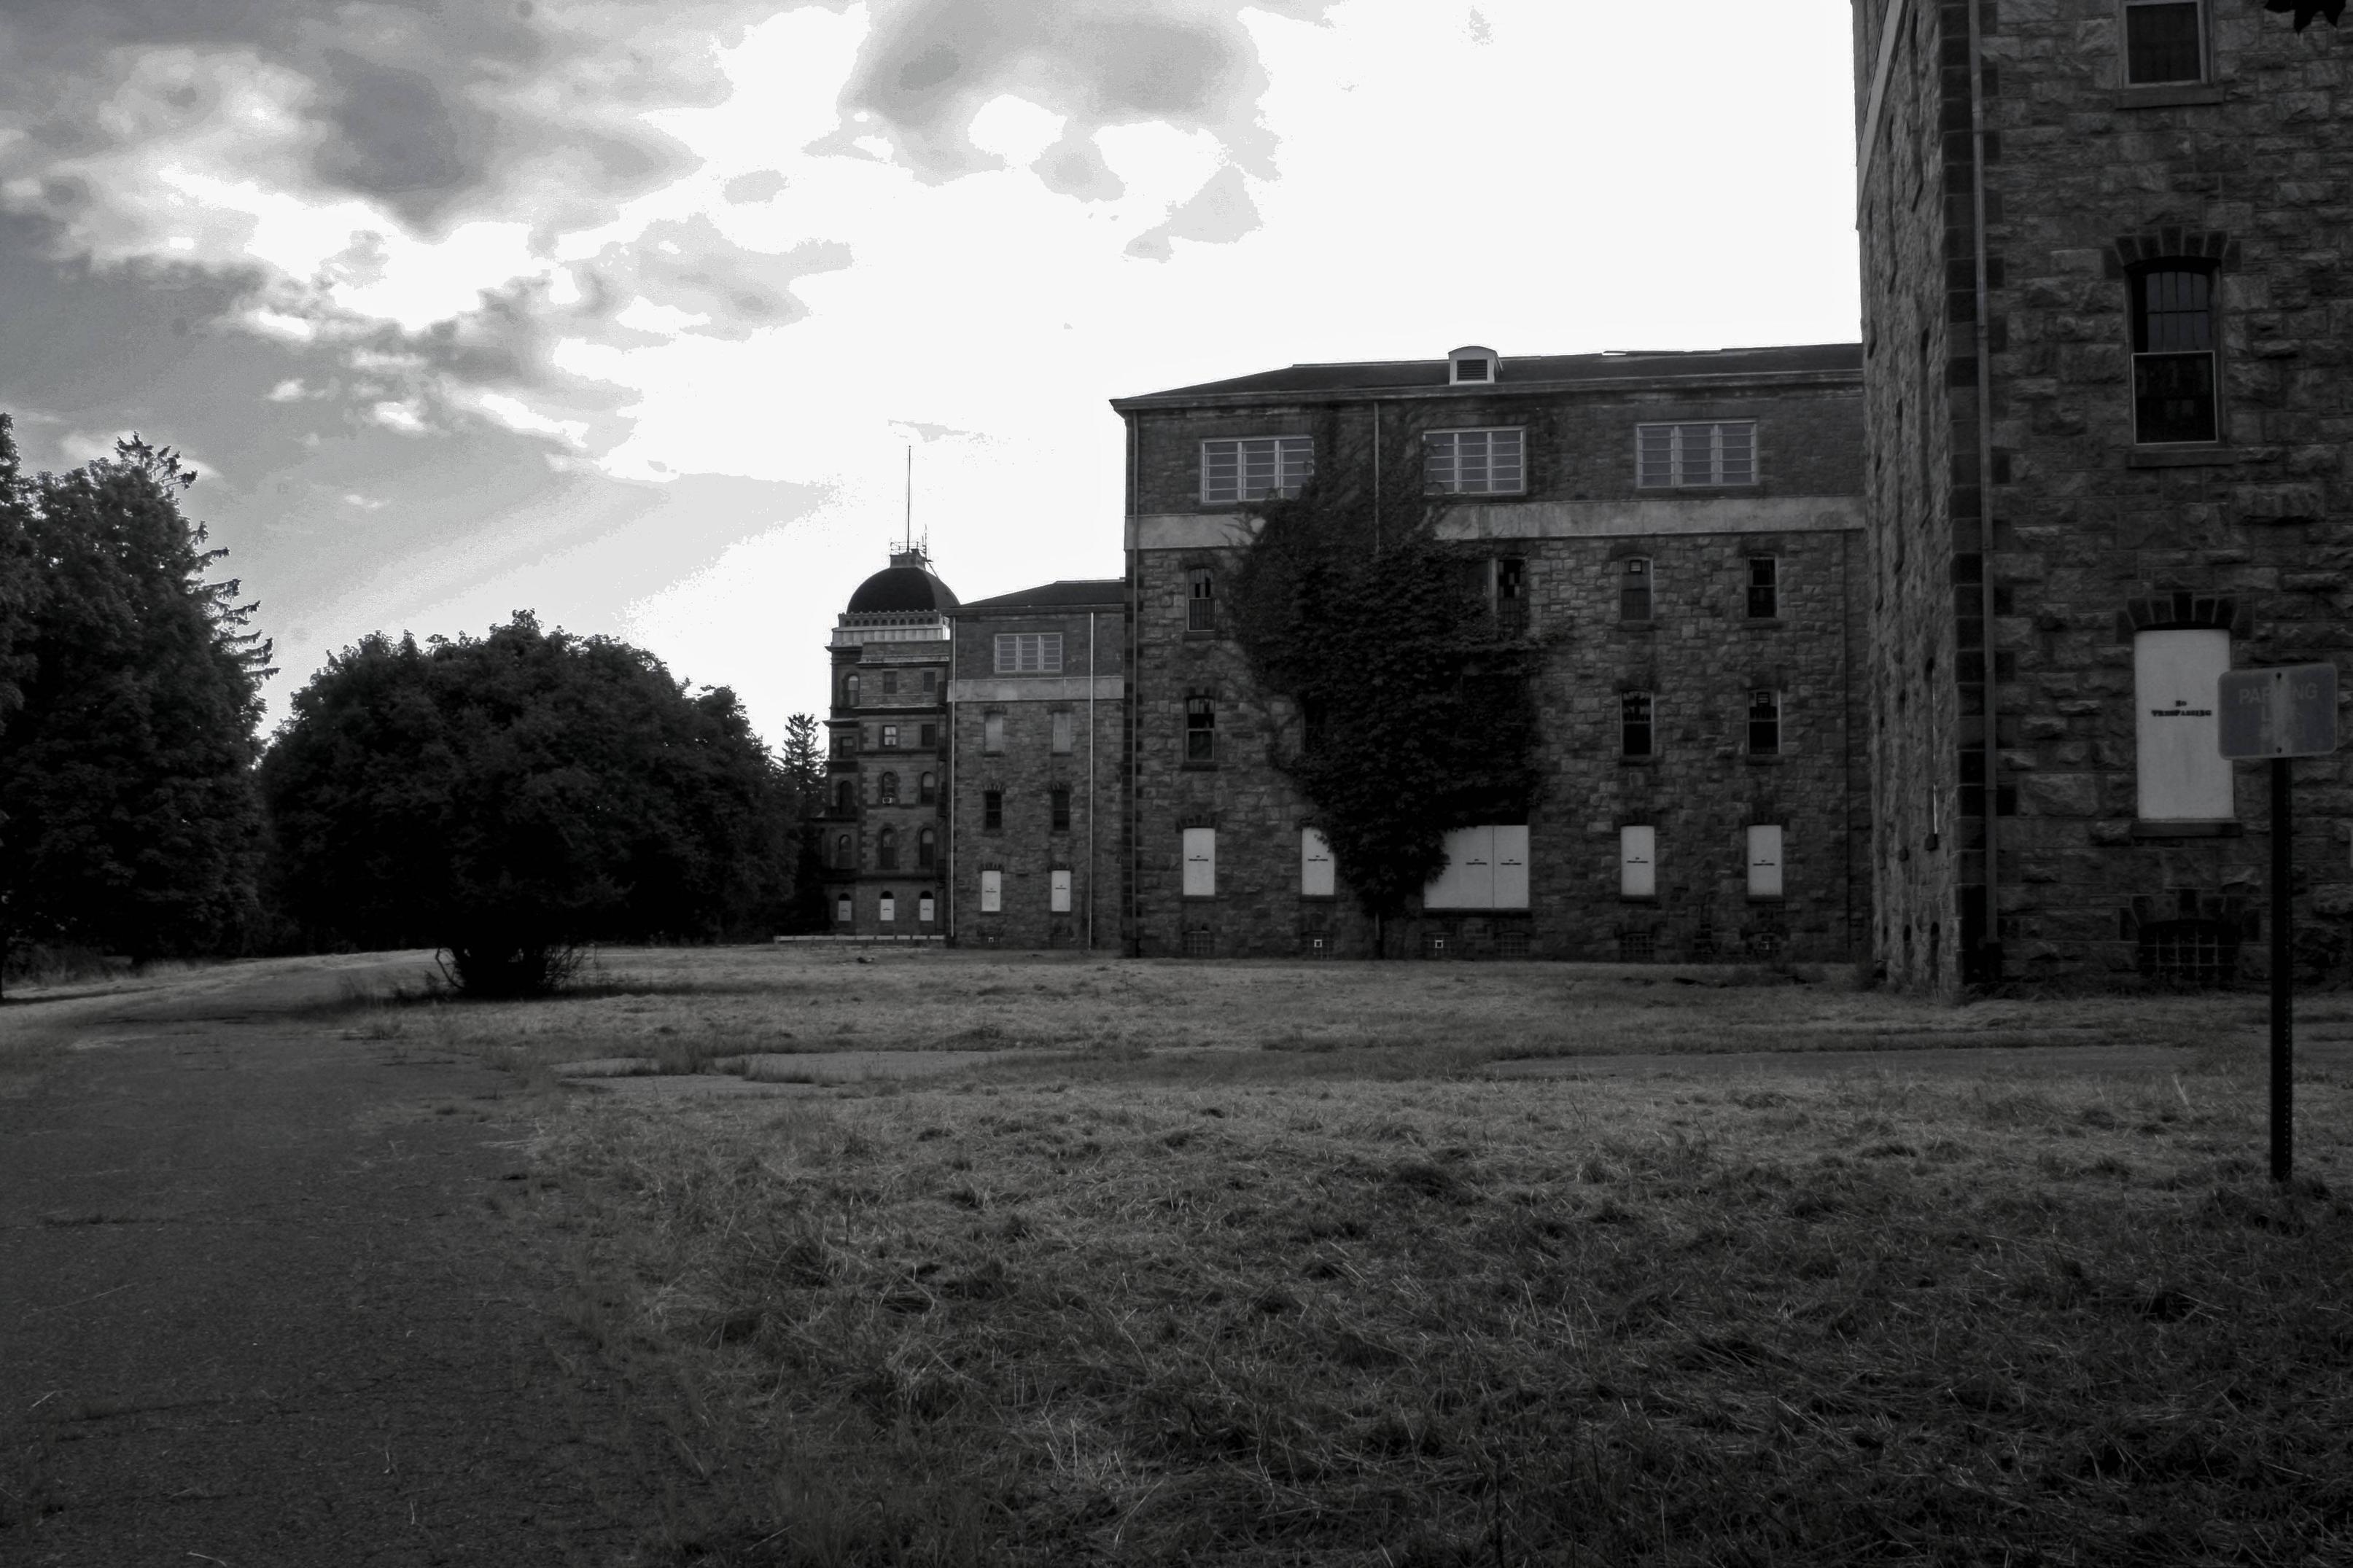 Graystone park psychiatric hospital